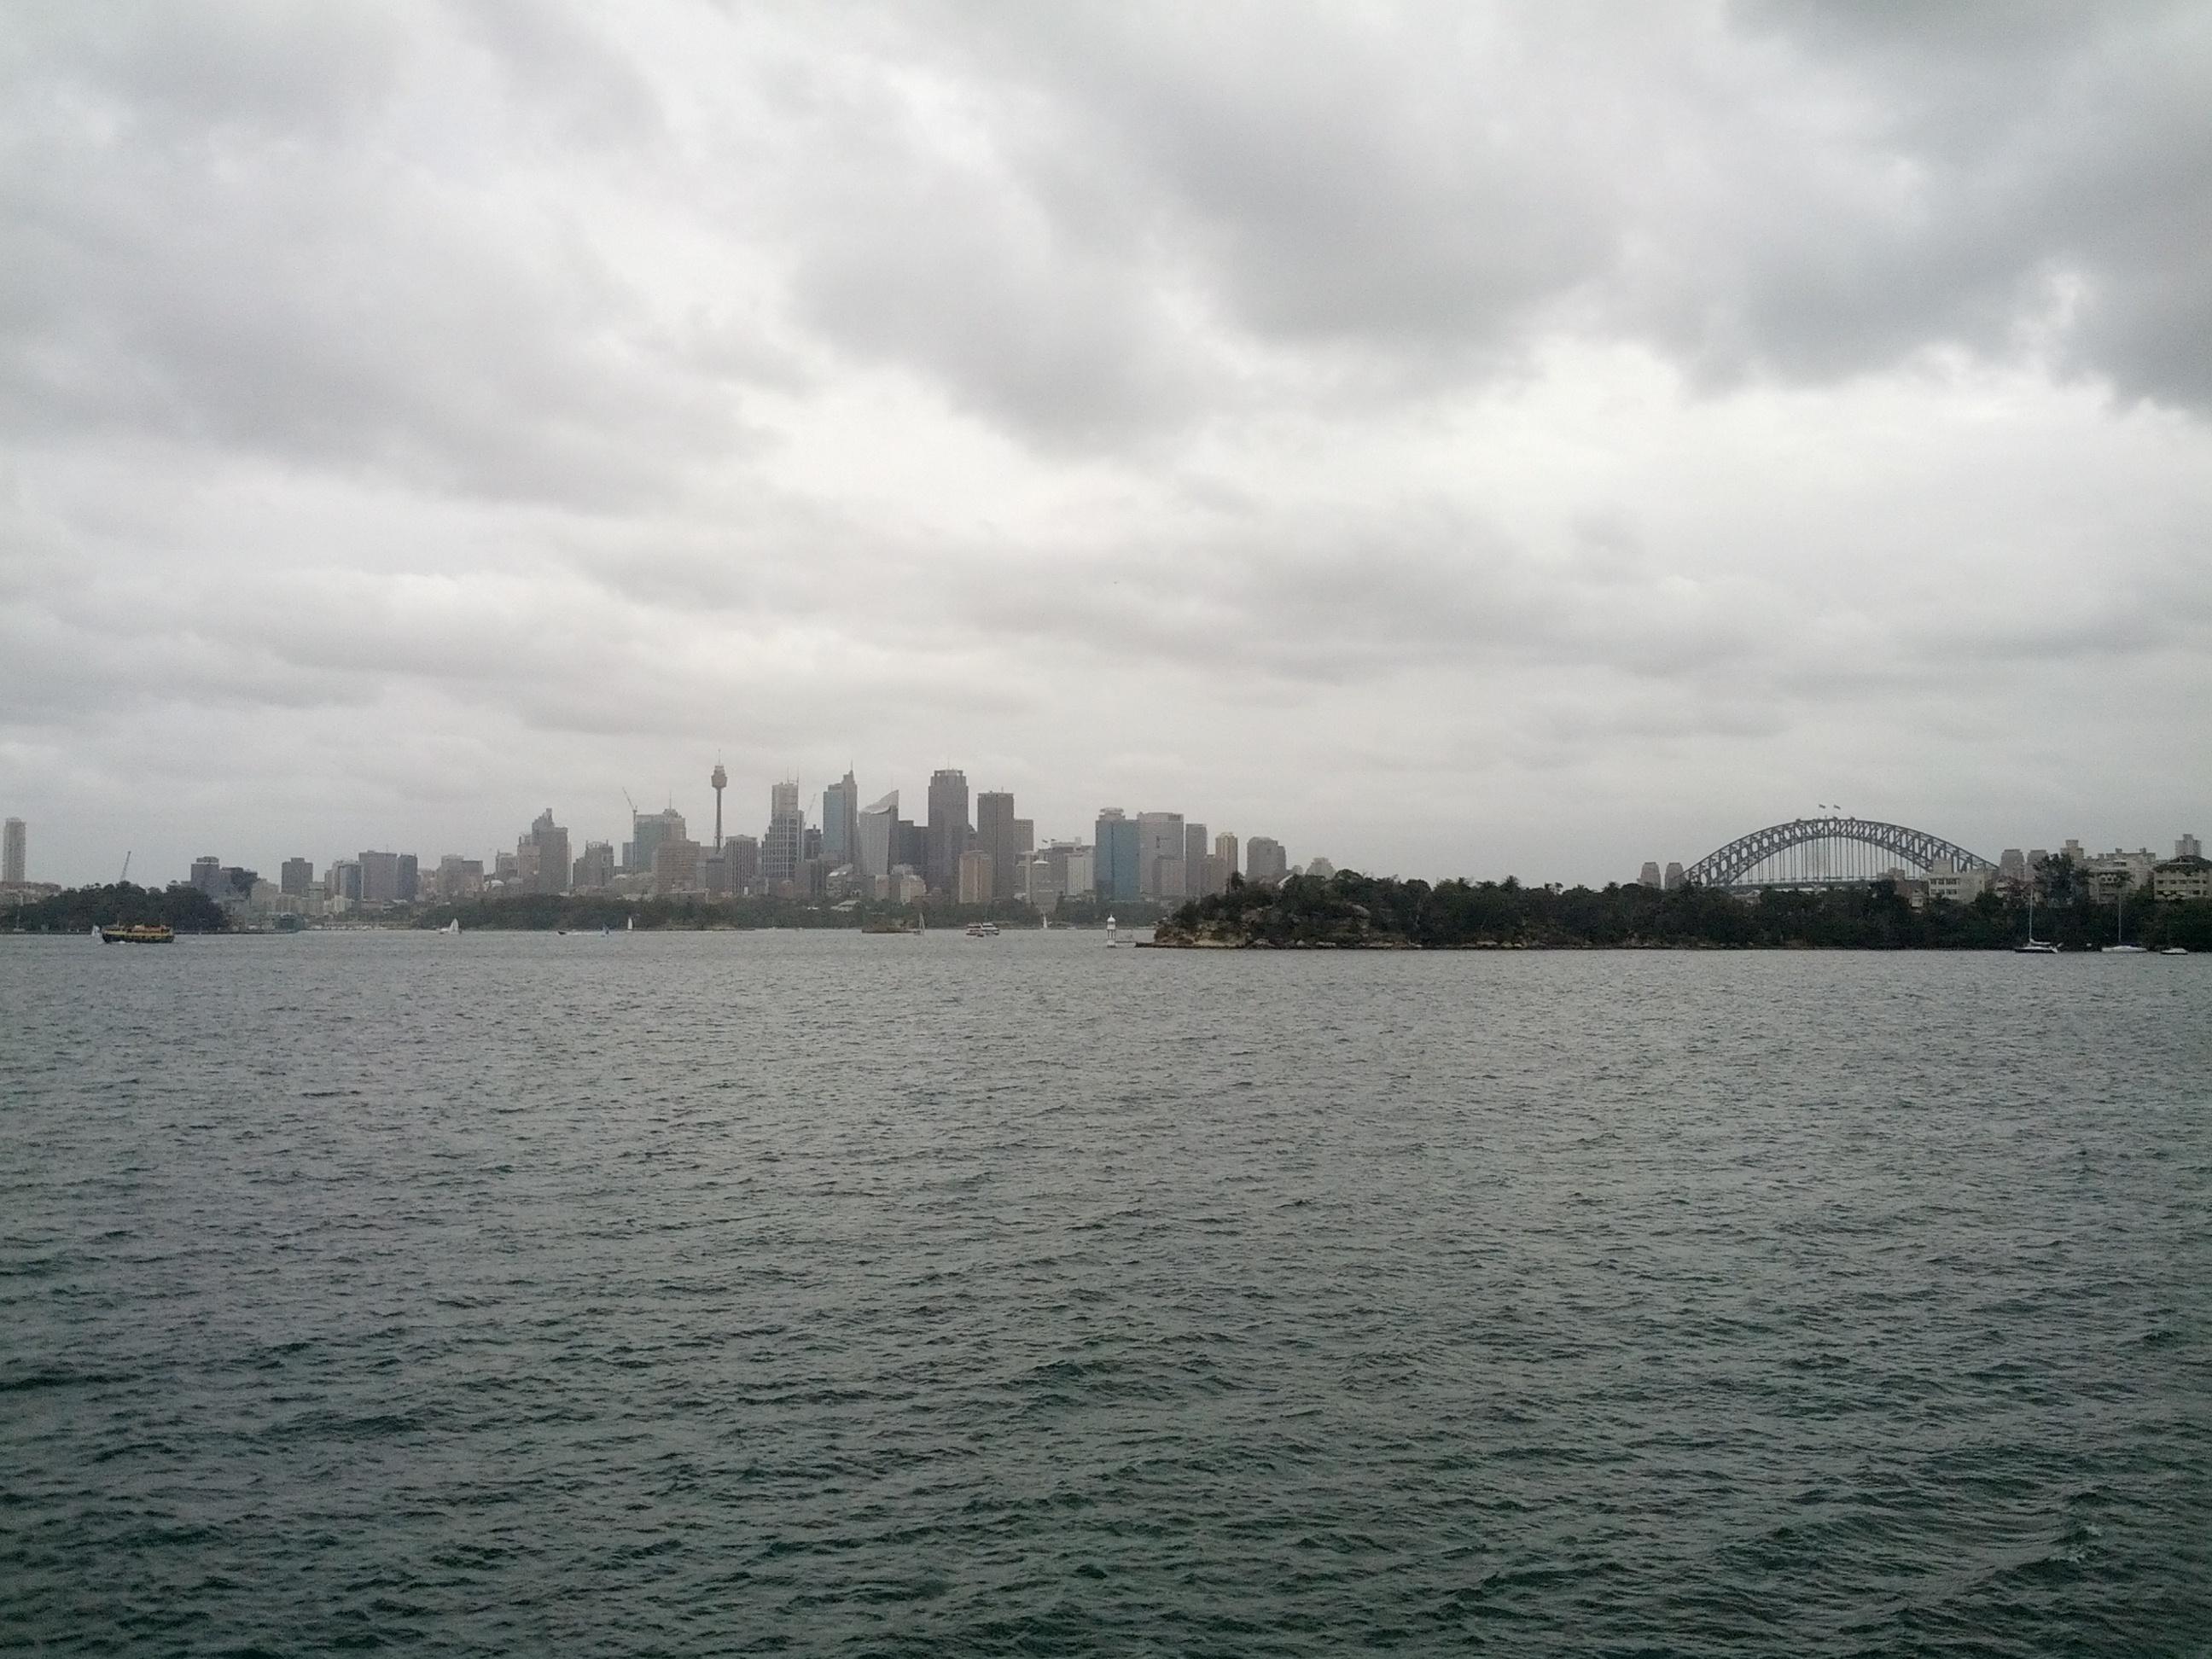 City looks pretty far away already!